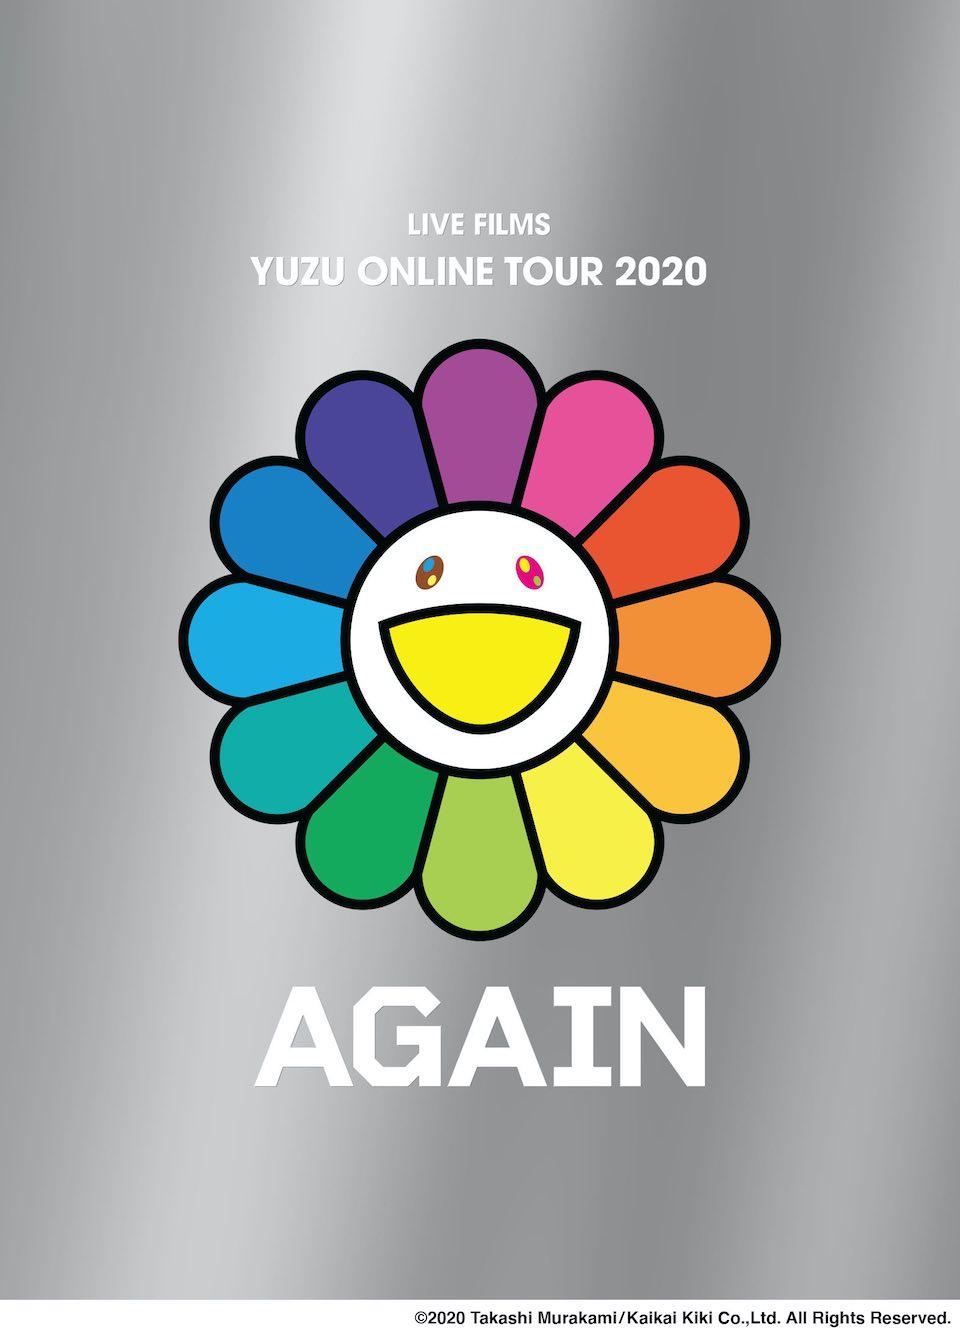 20201126_YZ_OnlineTourAGAIN.jpg